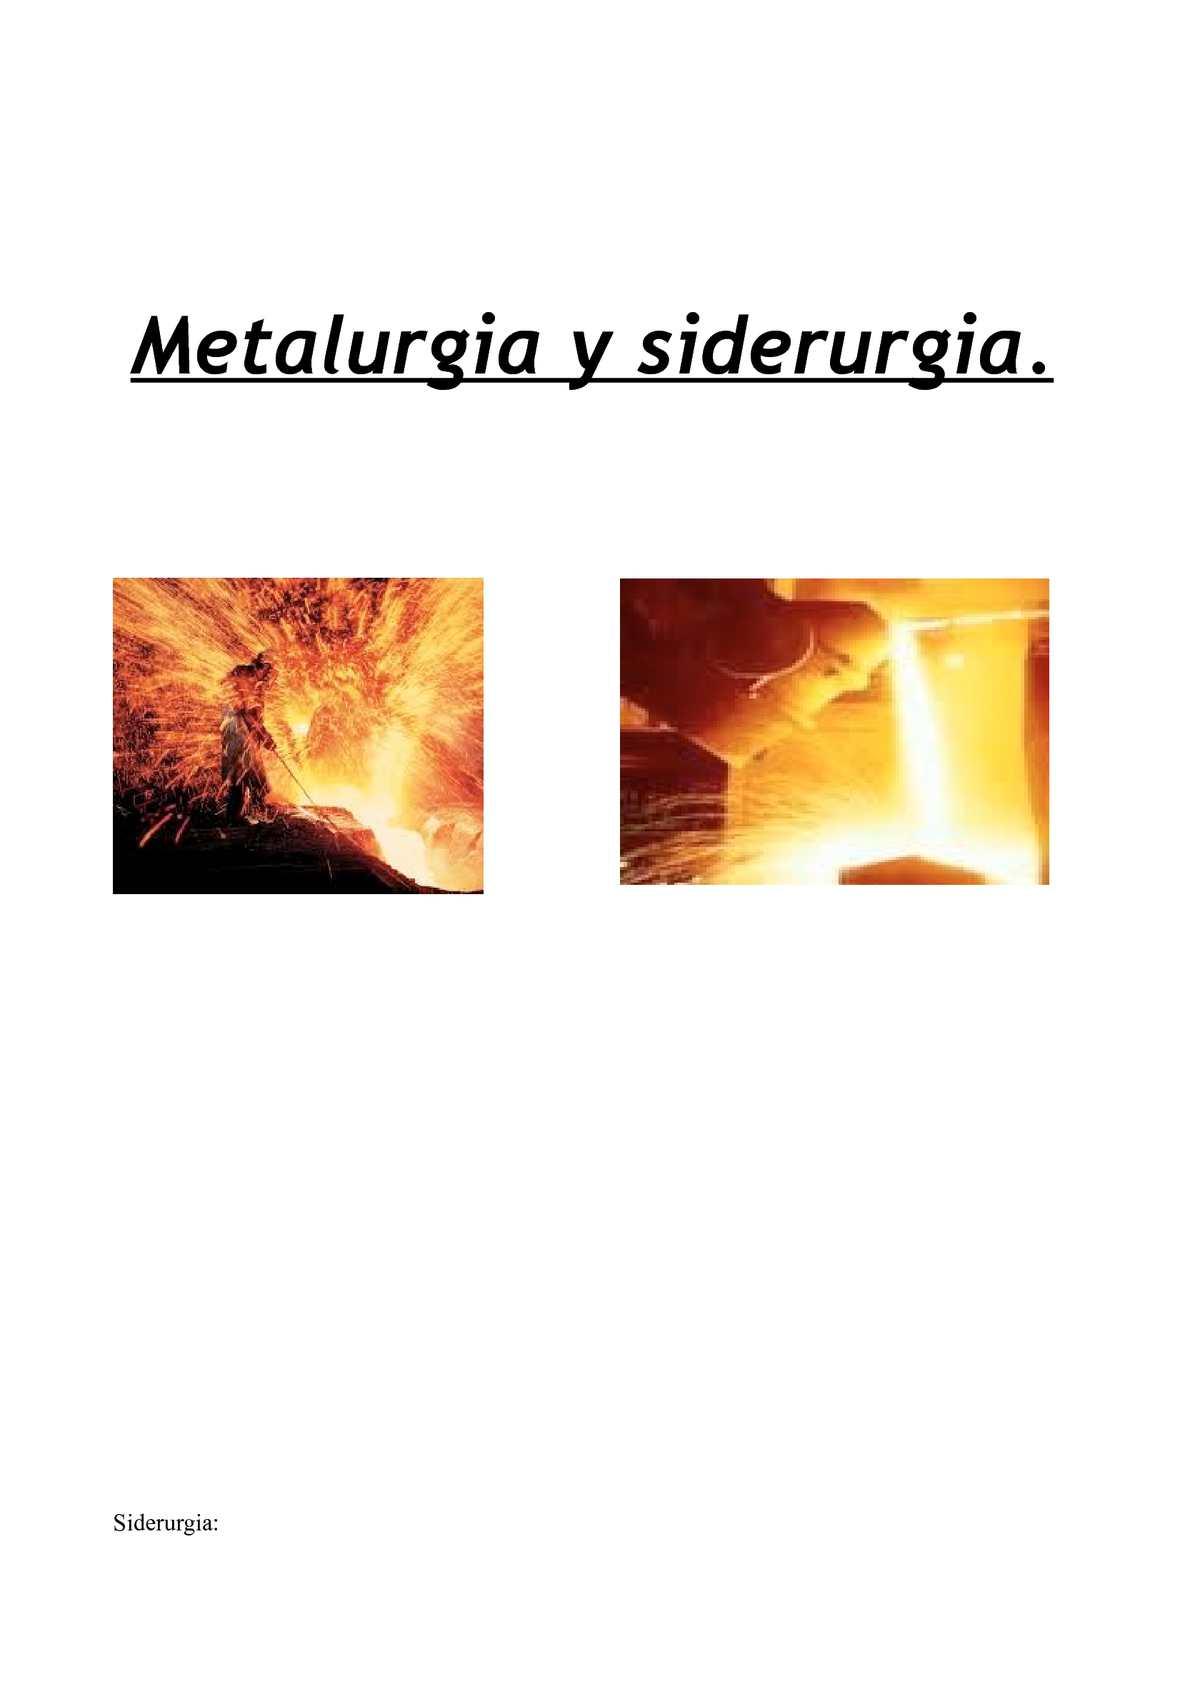 metalurgia siderurgia